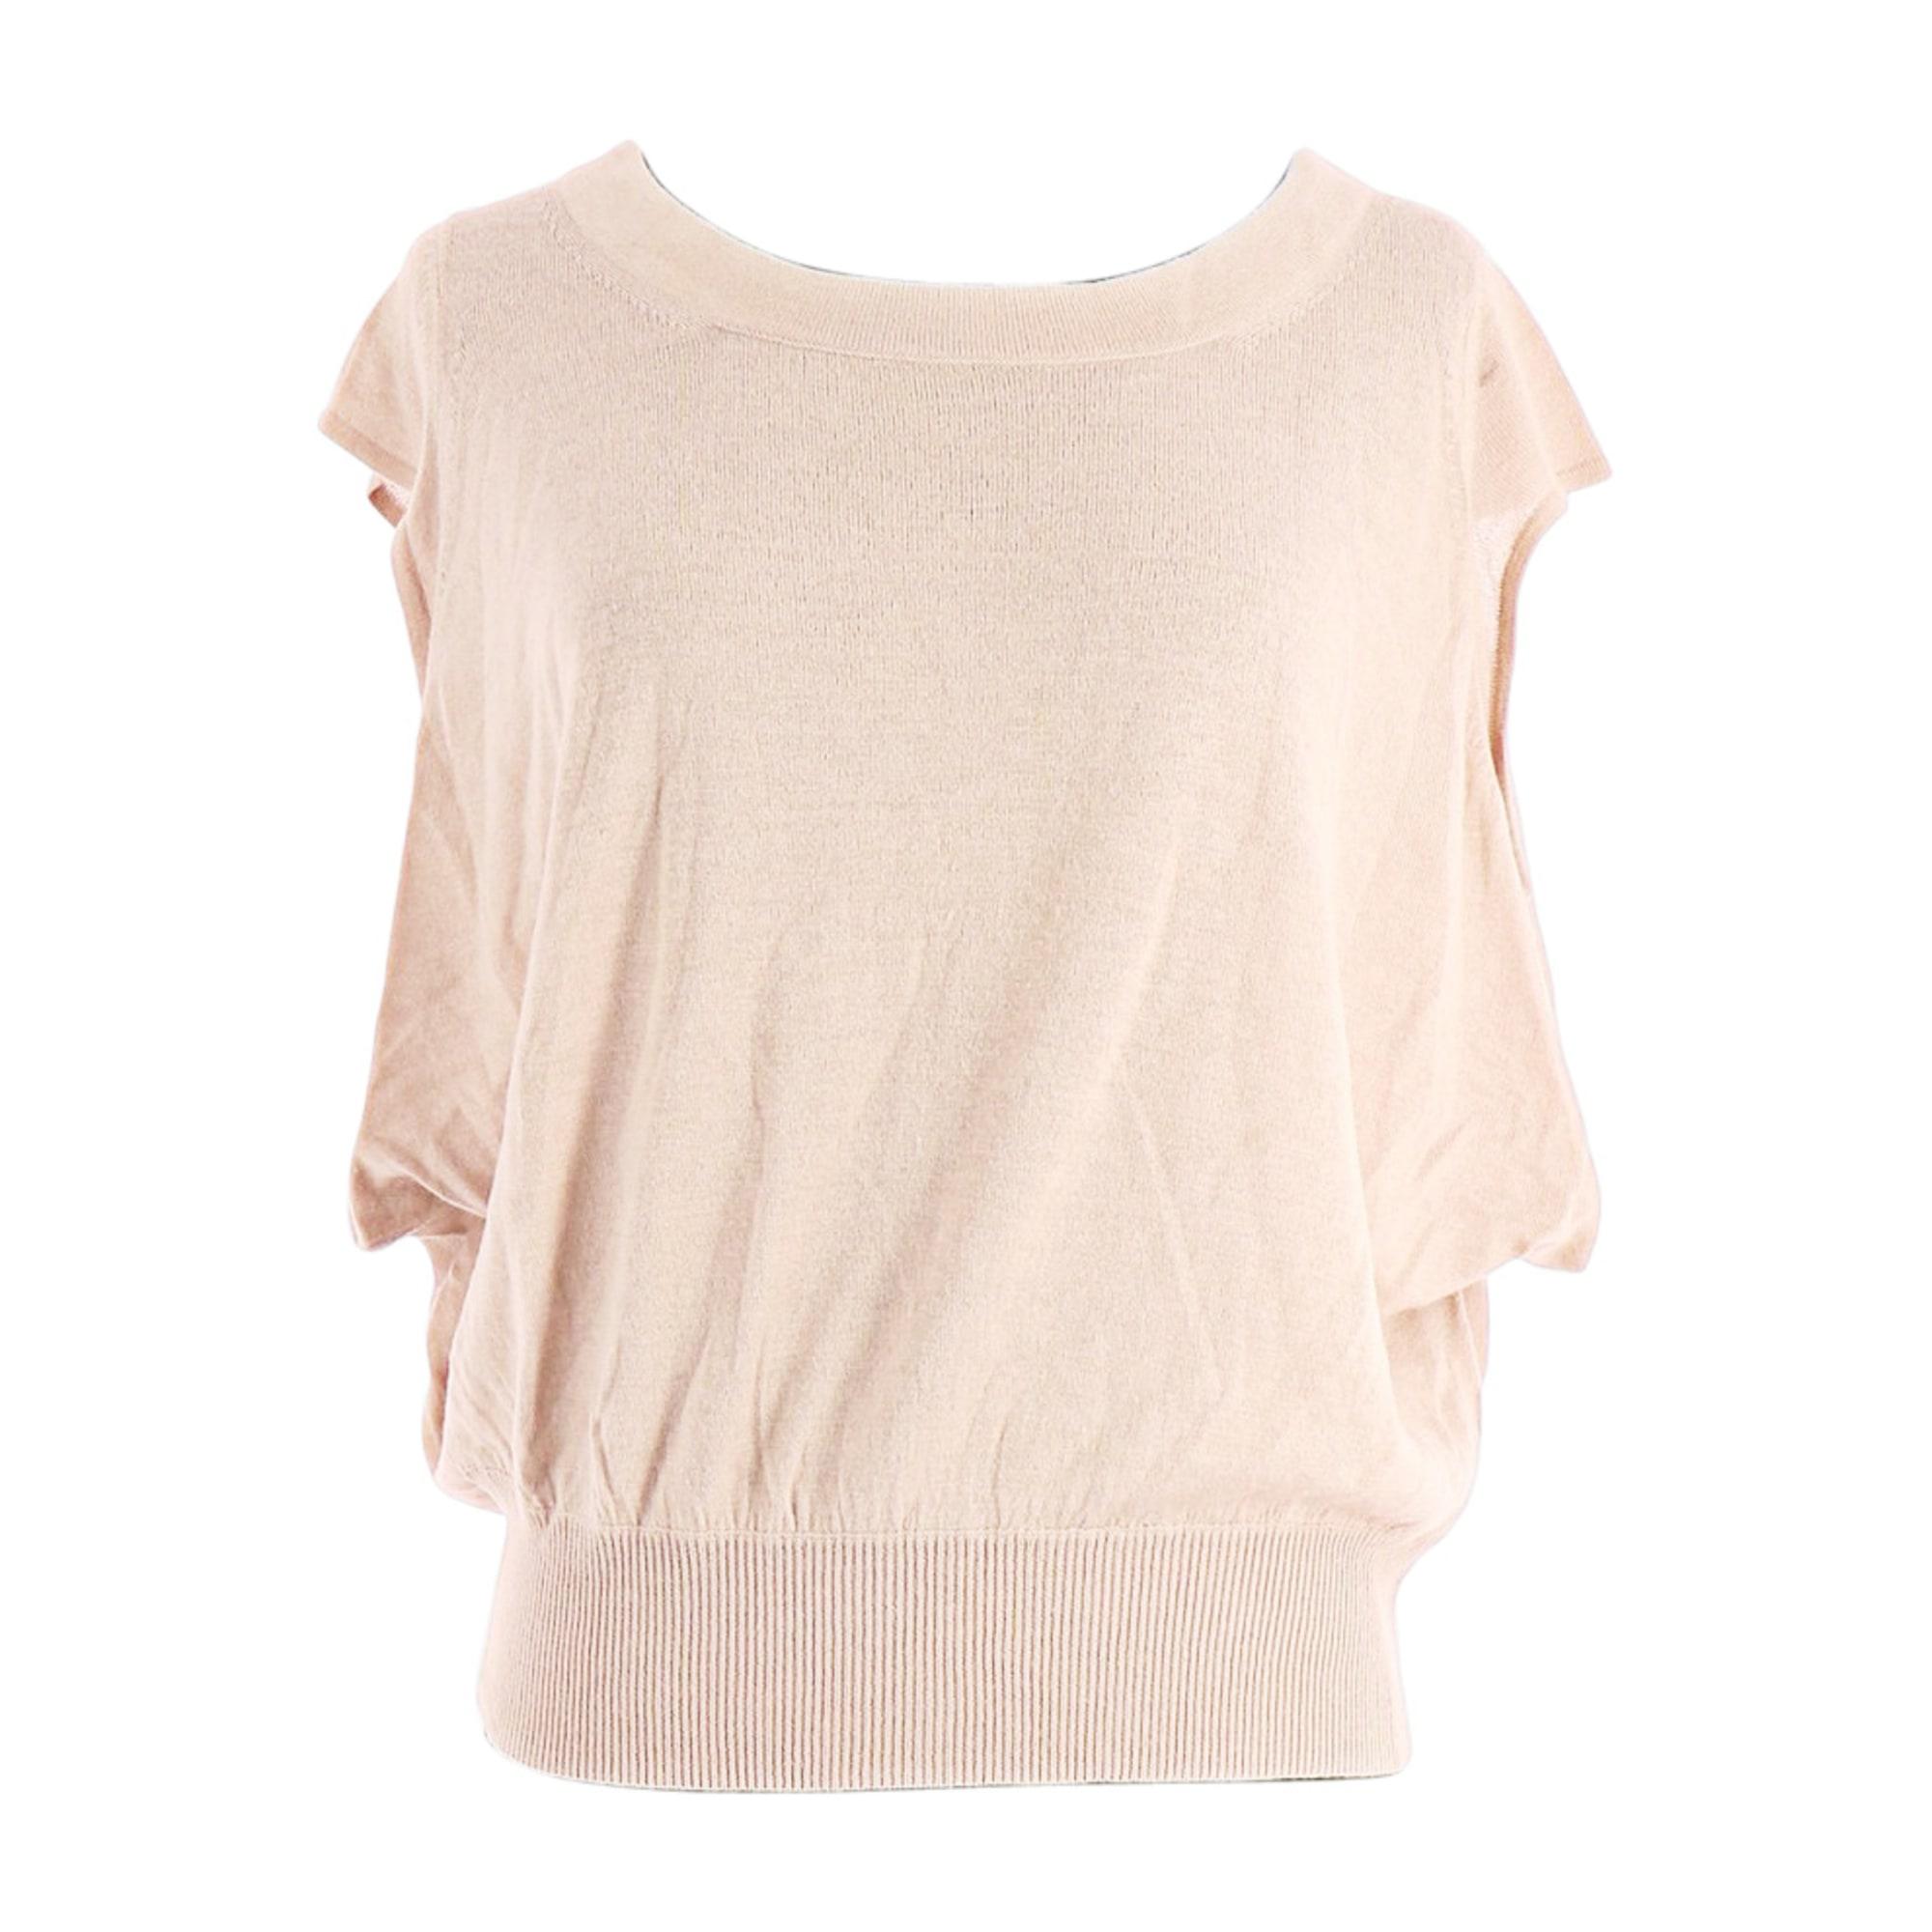 Top, tee-shirt VANESSA BRUNO Rose, fuschia, vieux rose